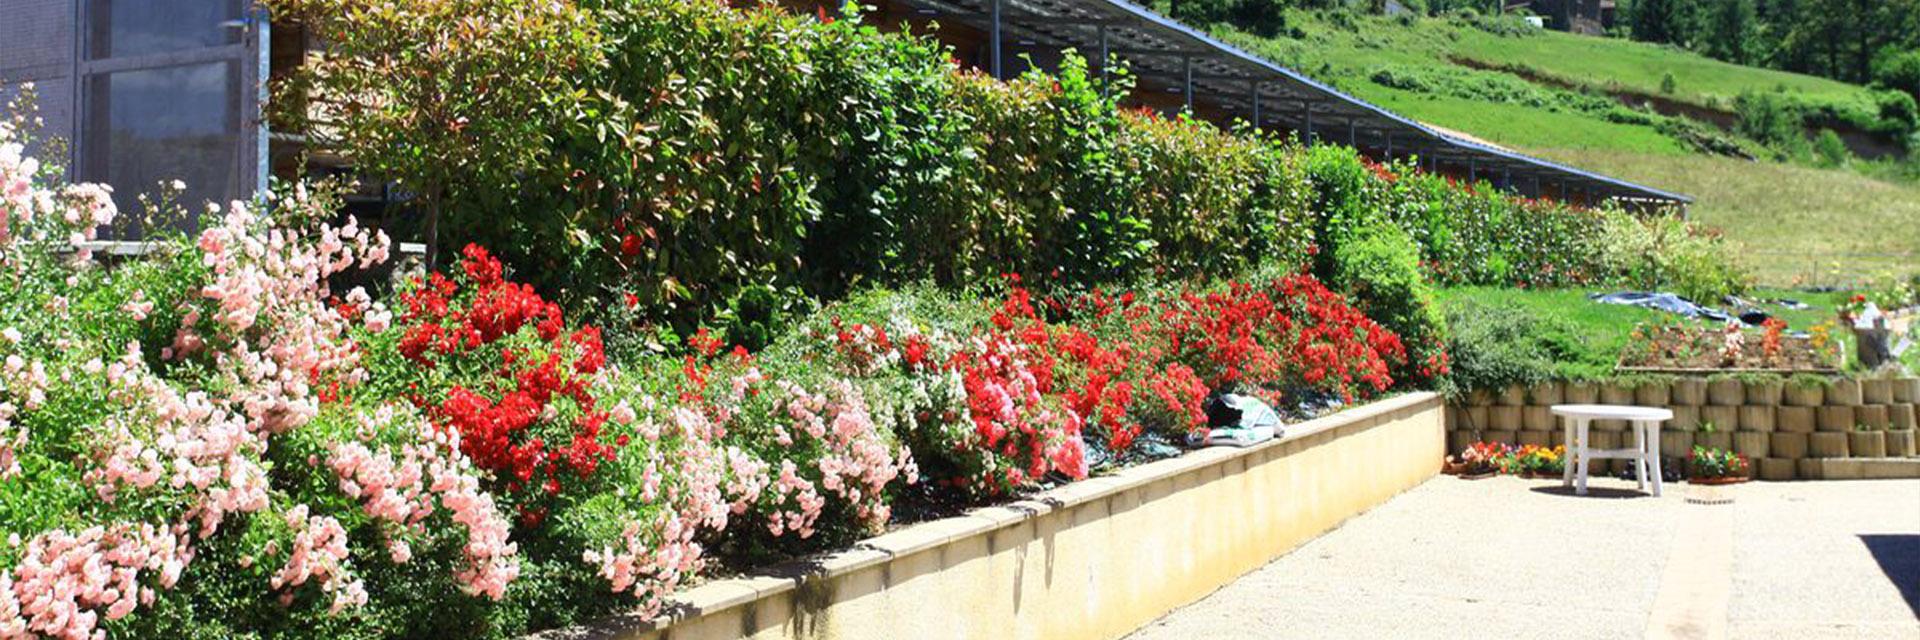 Village_club_vacances_périgord-quercy-terrou-fleurs-jardin